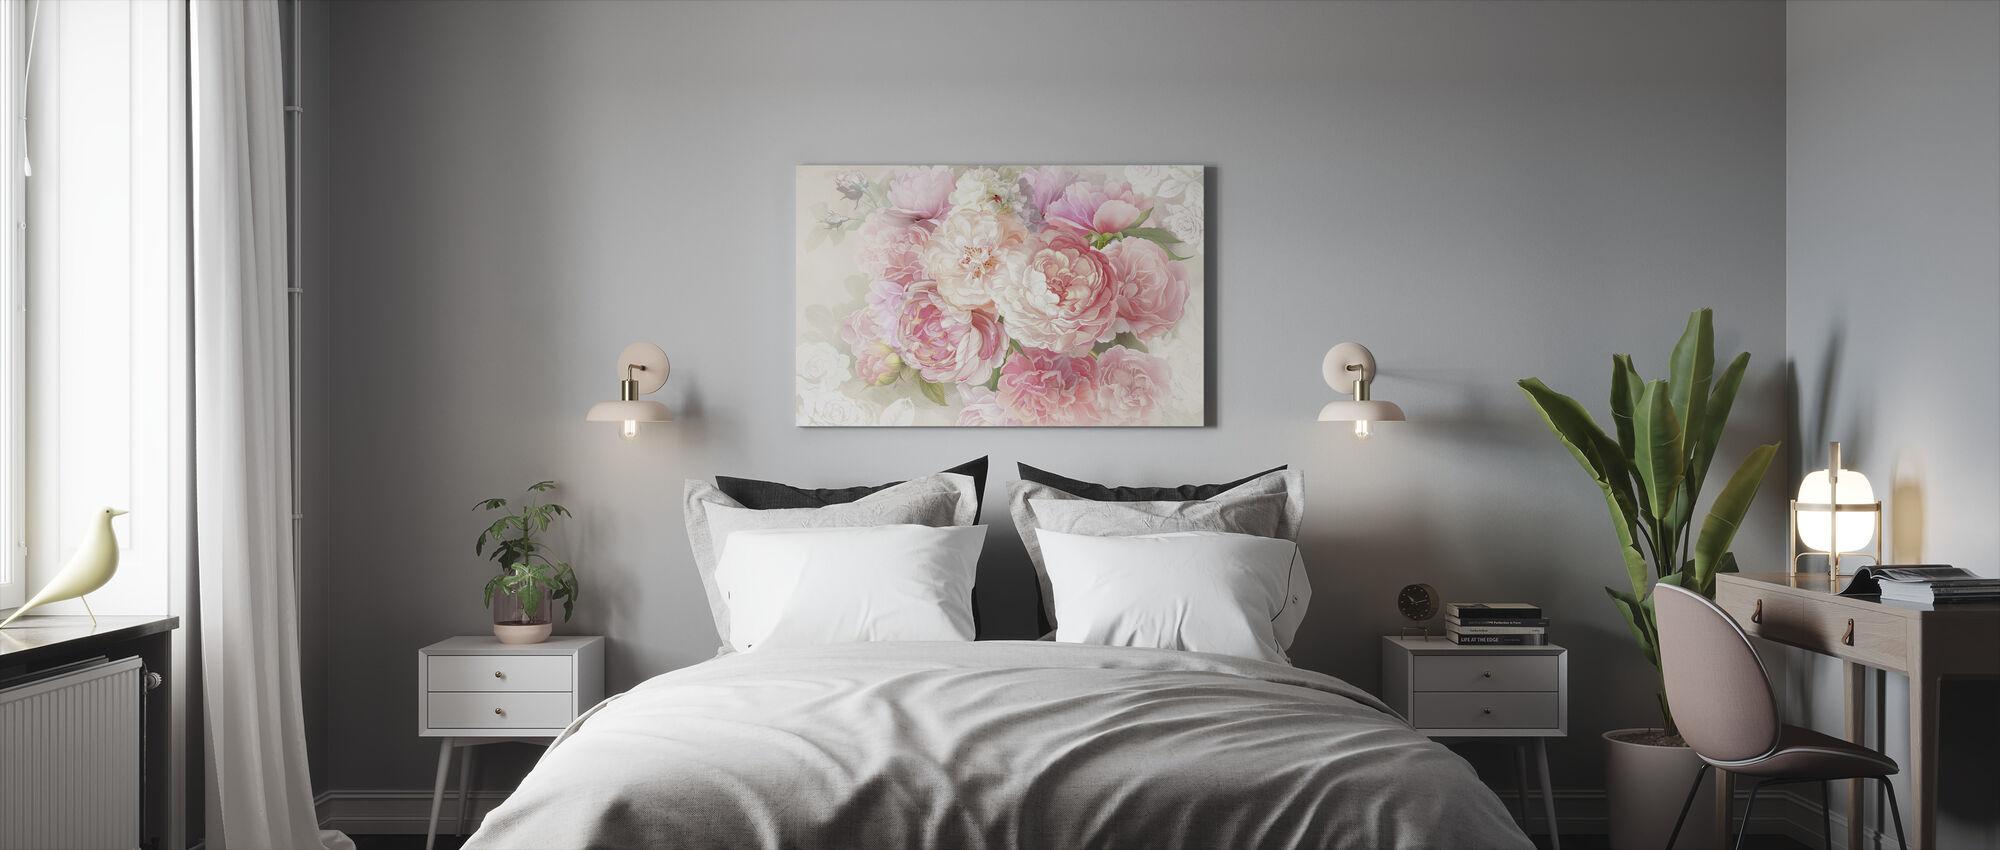 Pionit - Canvastaulu - Makuuhuone